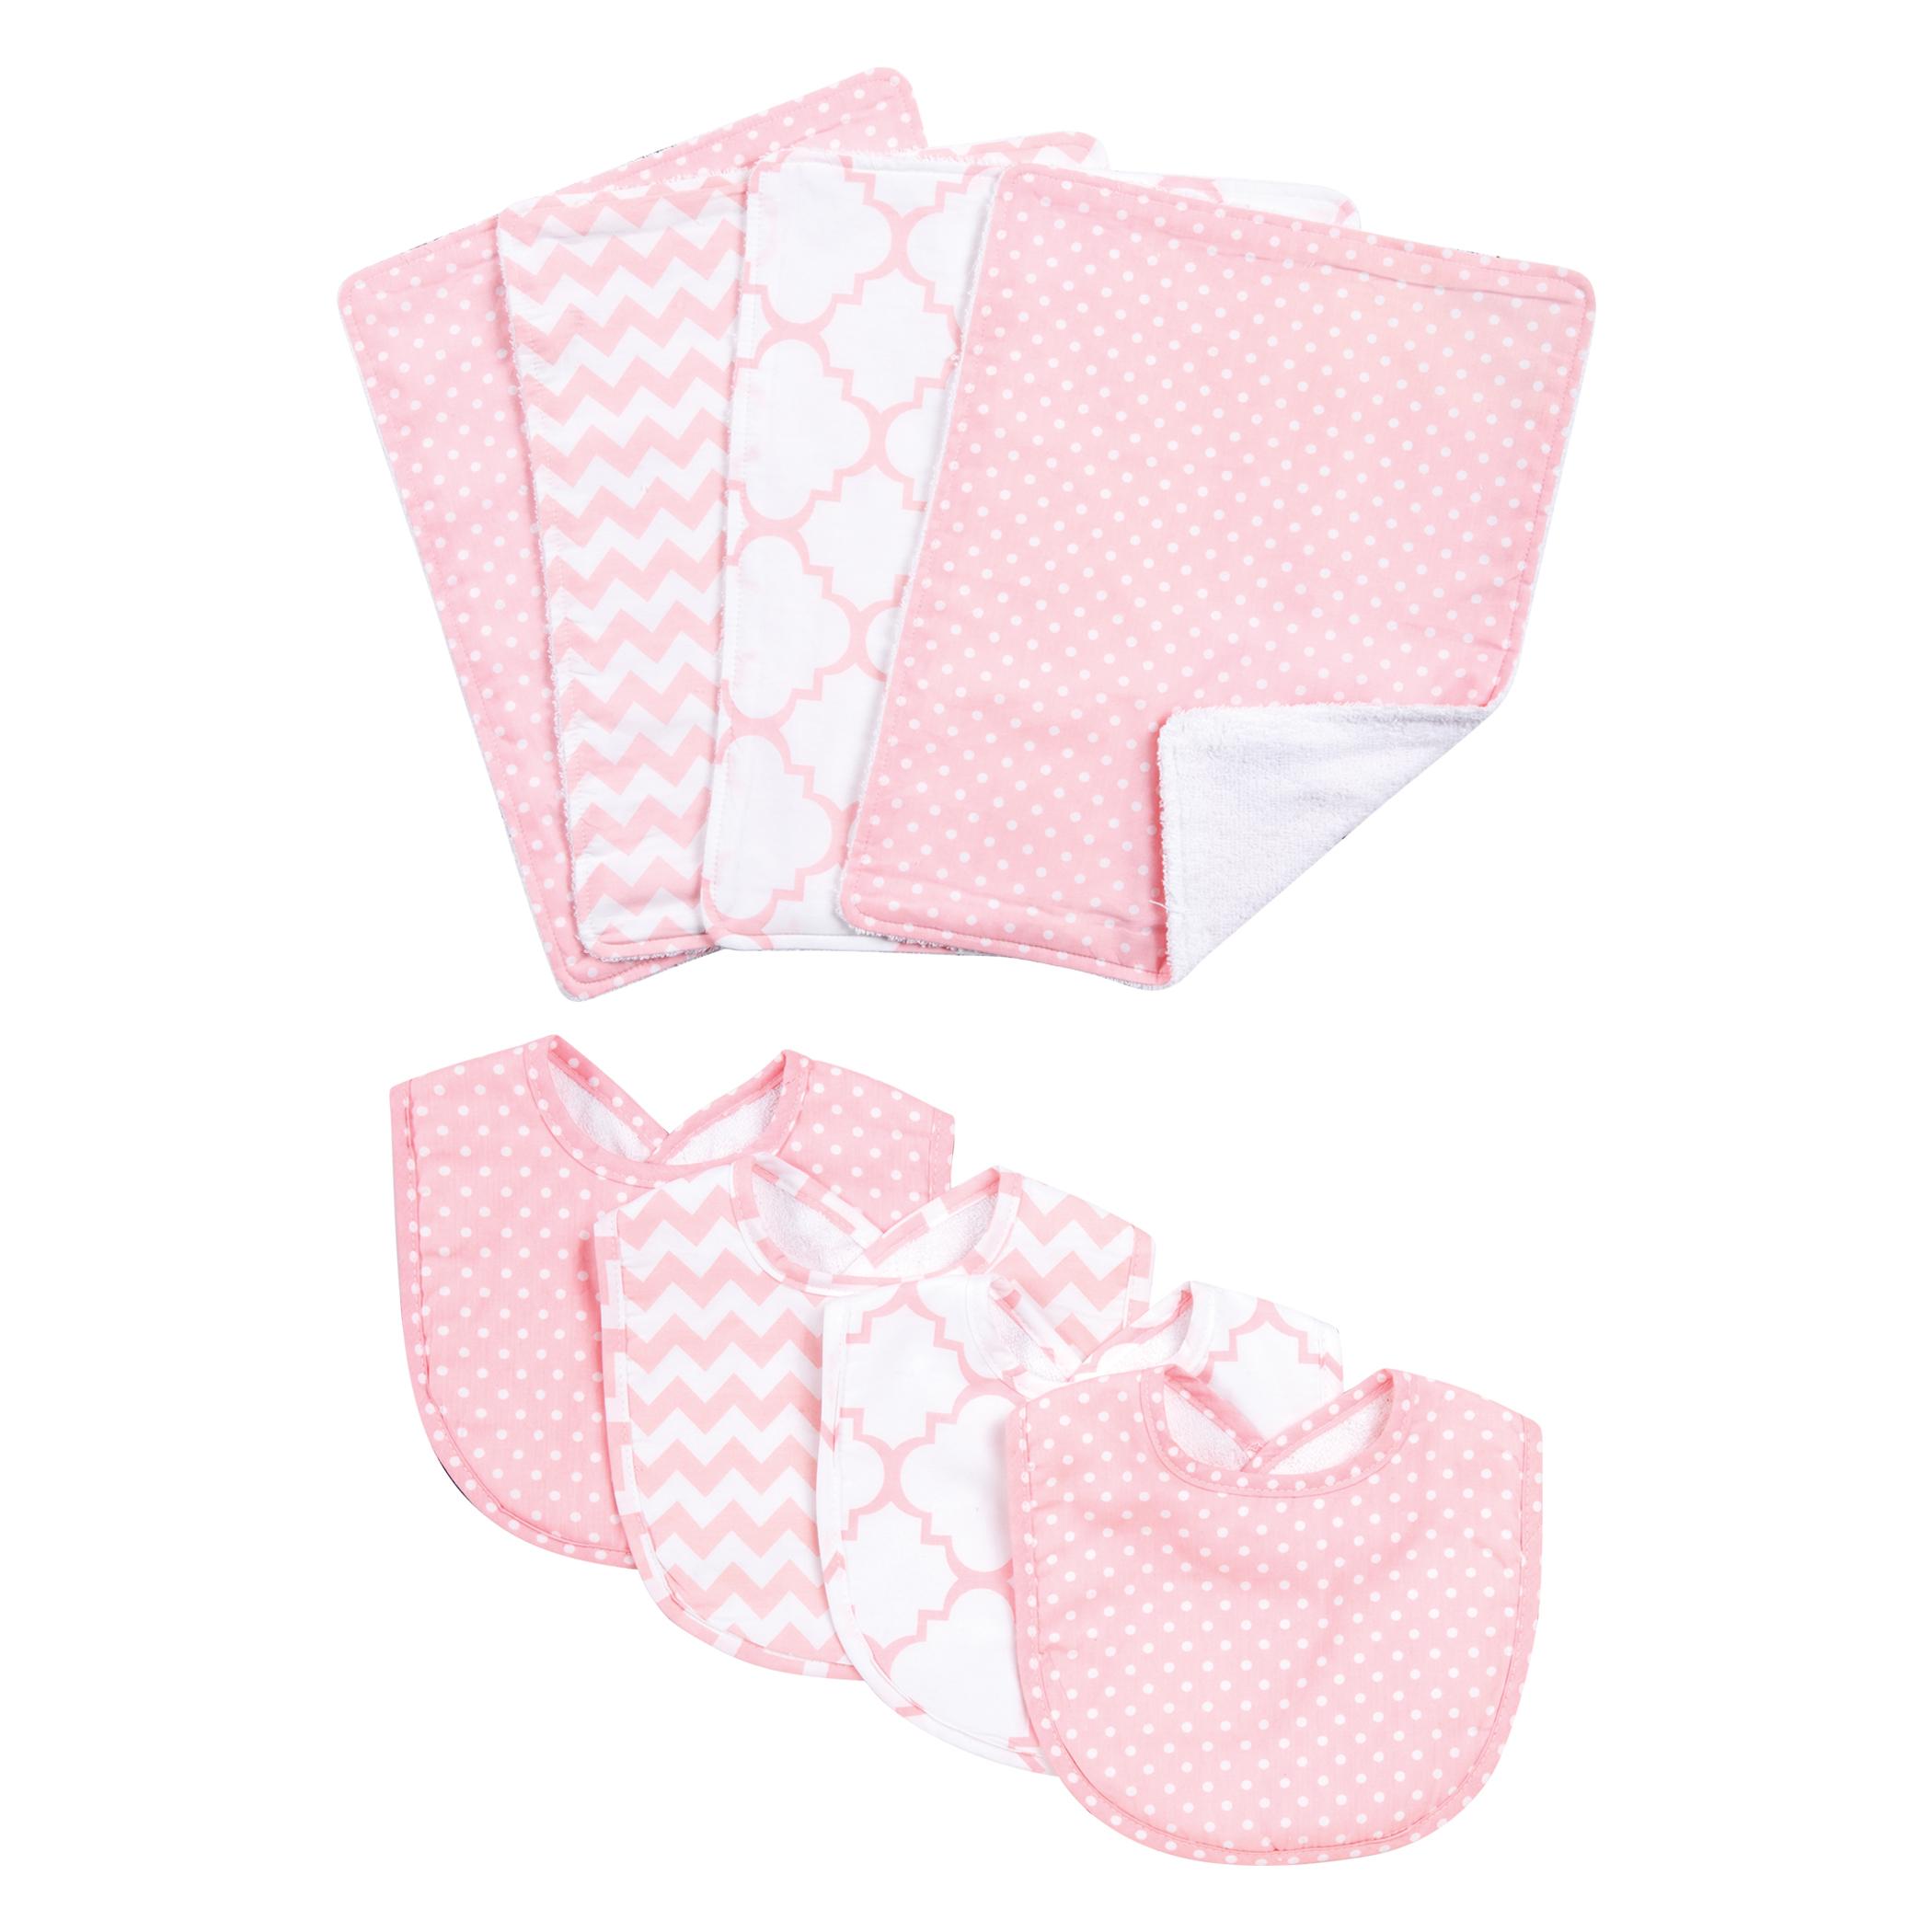 Pink Sky 8 Piece Bib and Burp Cloth Set